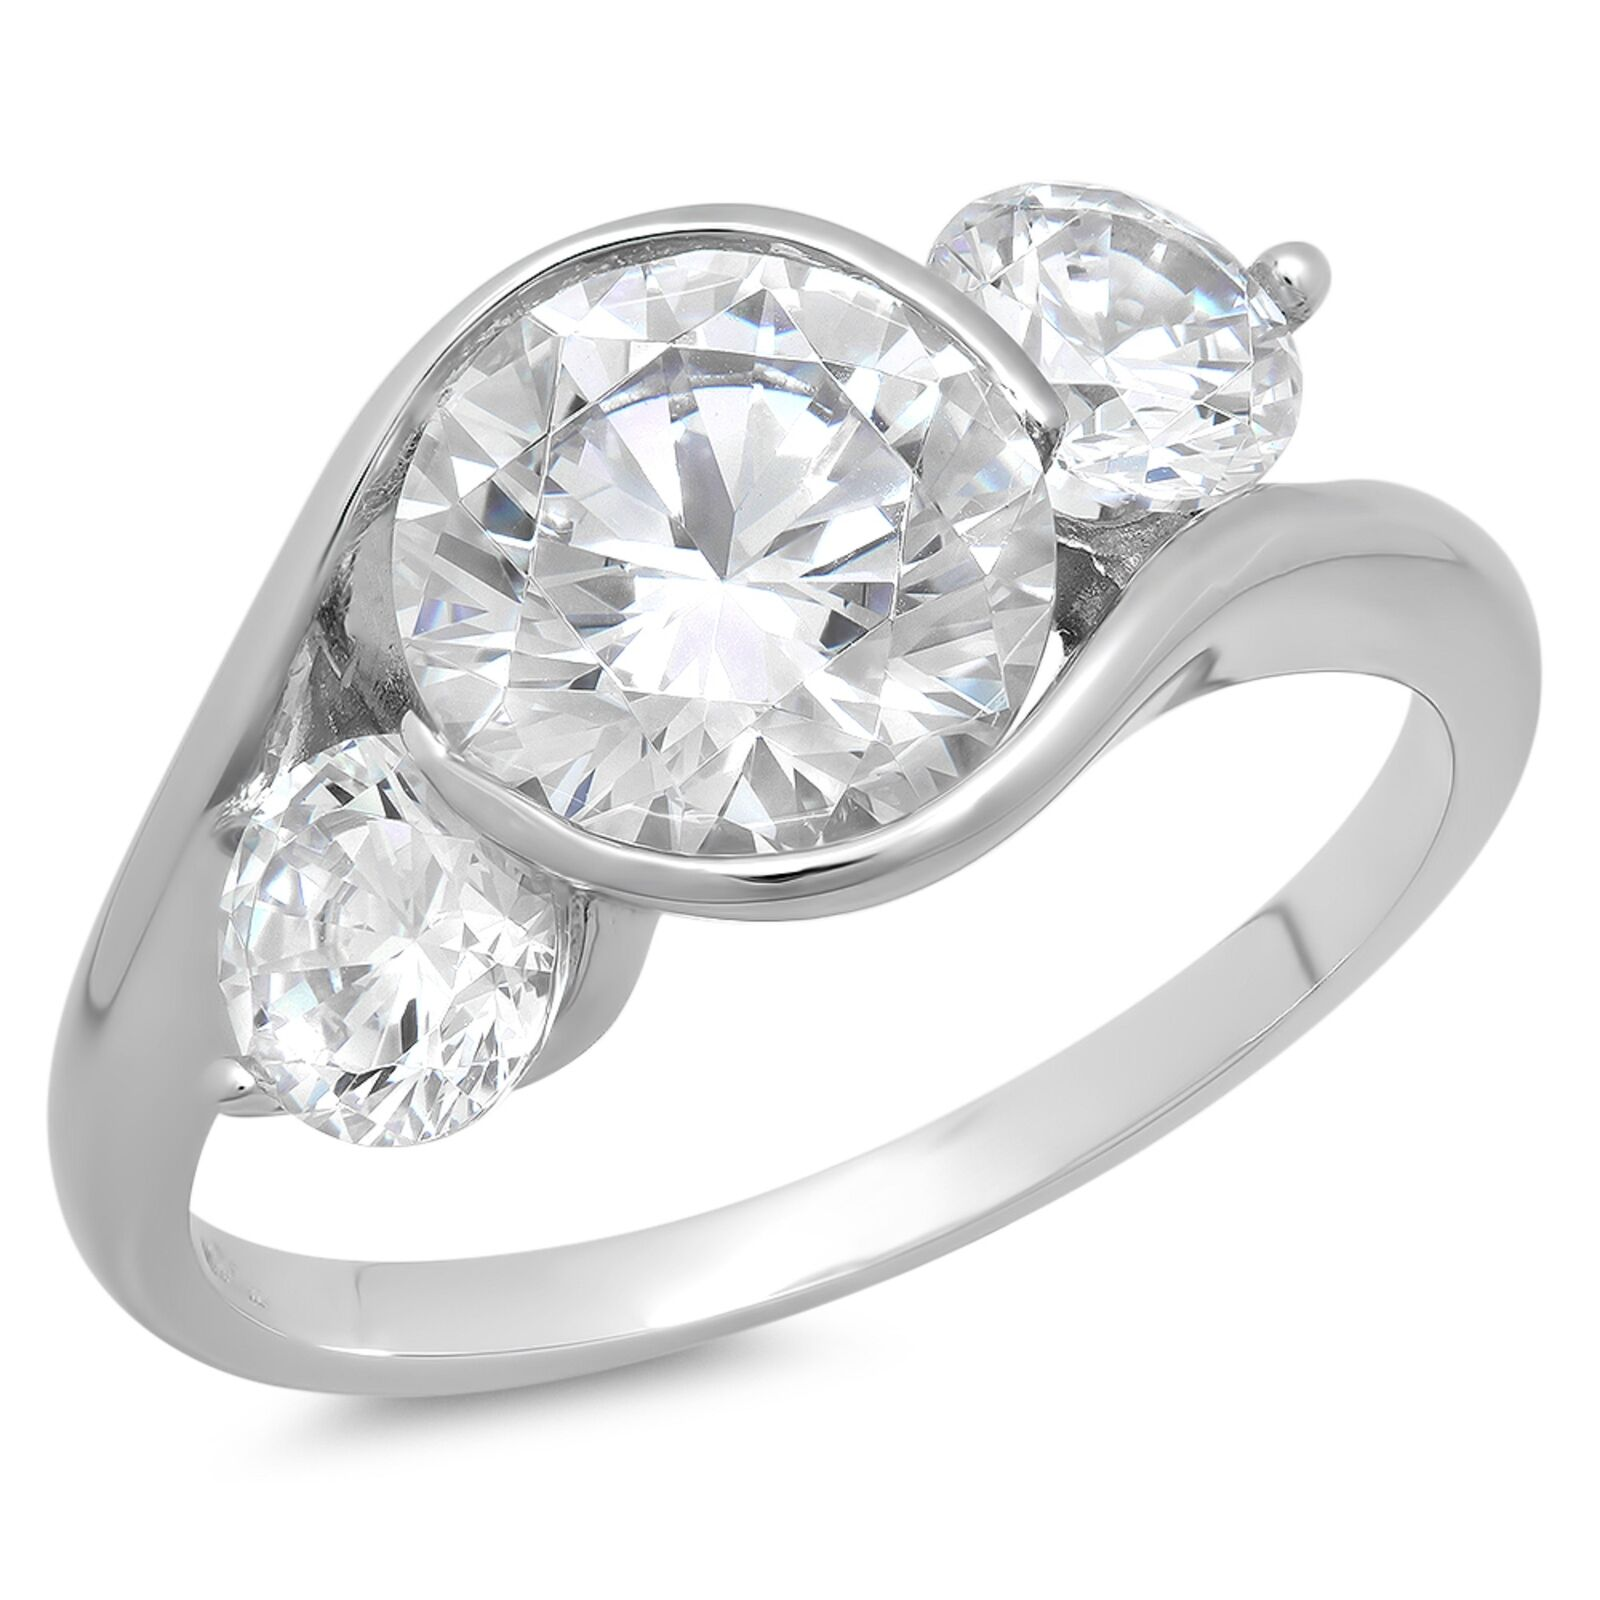 3.6ct Round Cut 3Stone Engagement Wedding Bridal Anniversary Ring 14k White gold